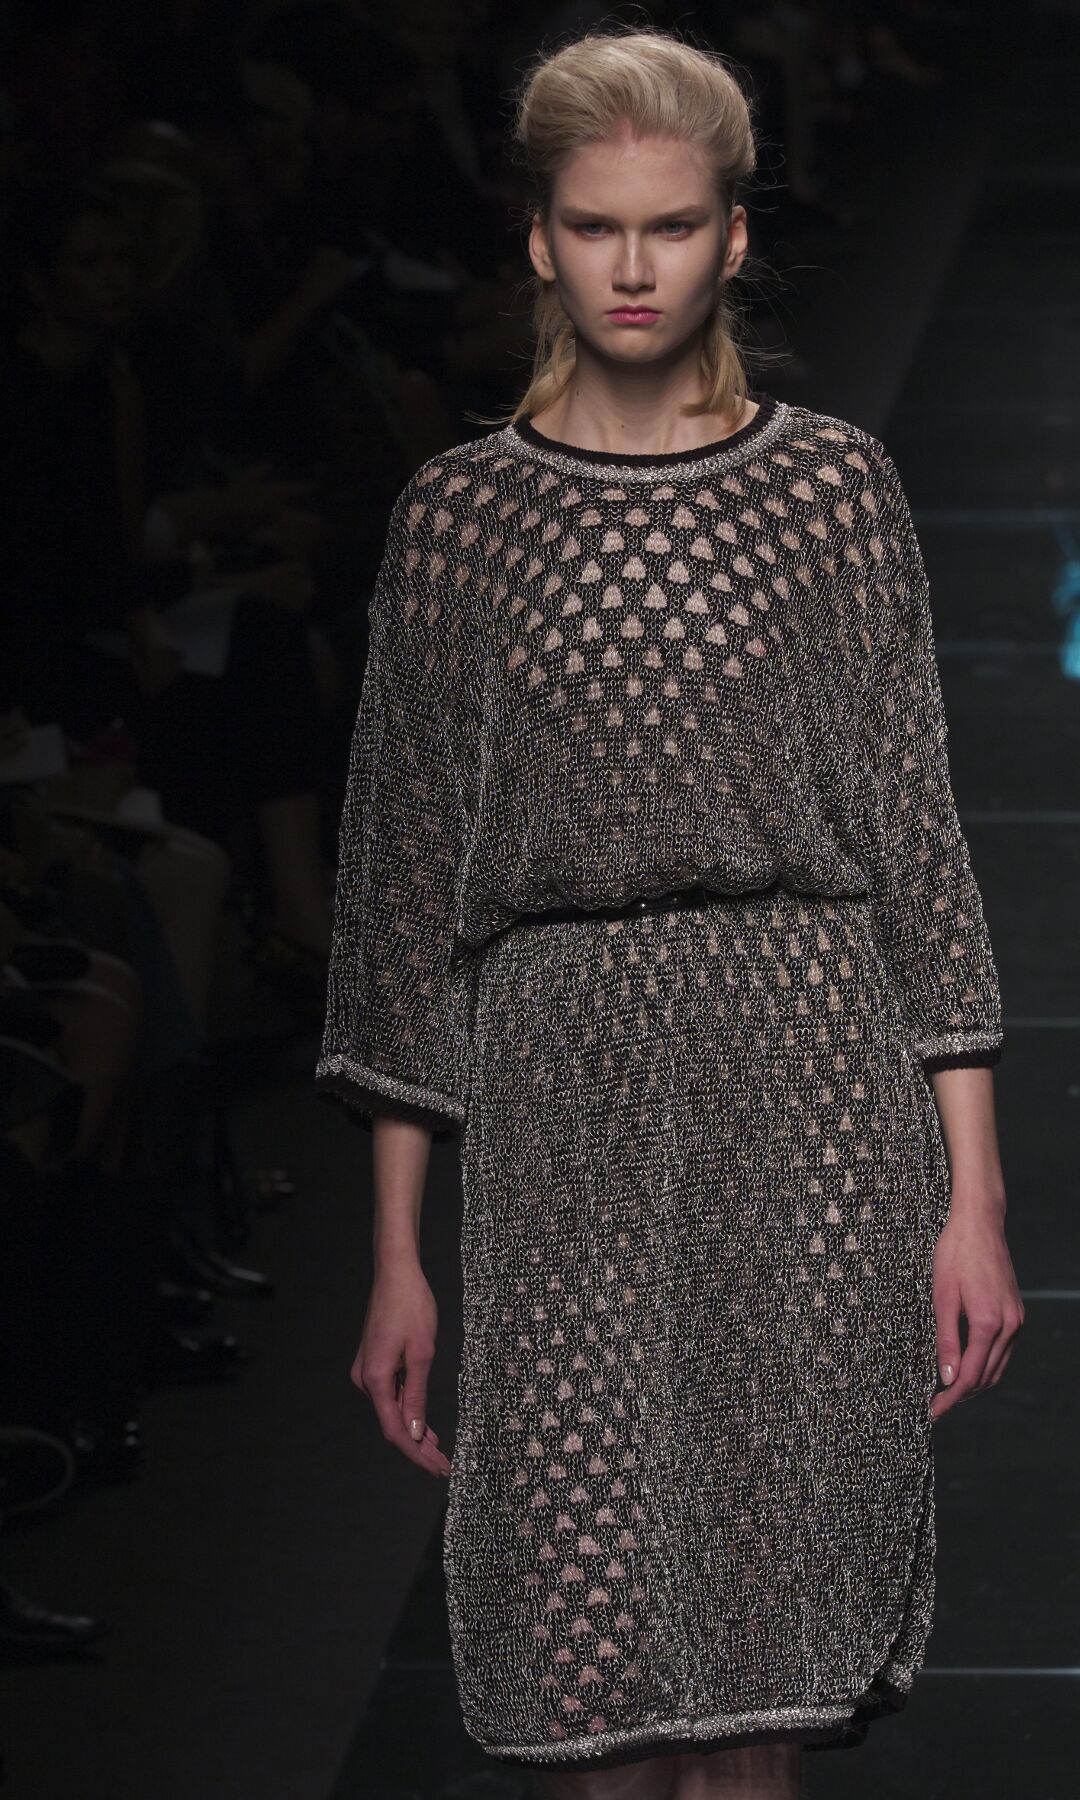 Anteprima Catwalk 2014 Fashion Show Milano Fashion Week